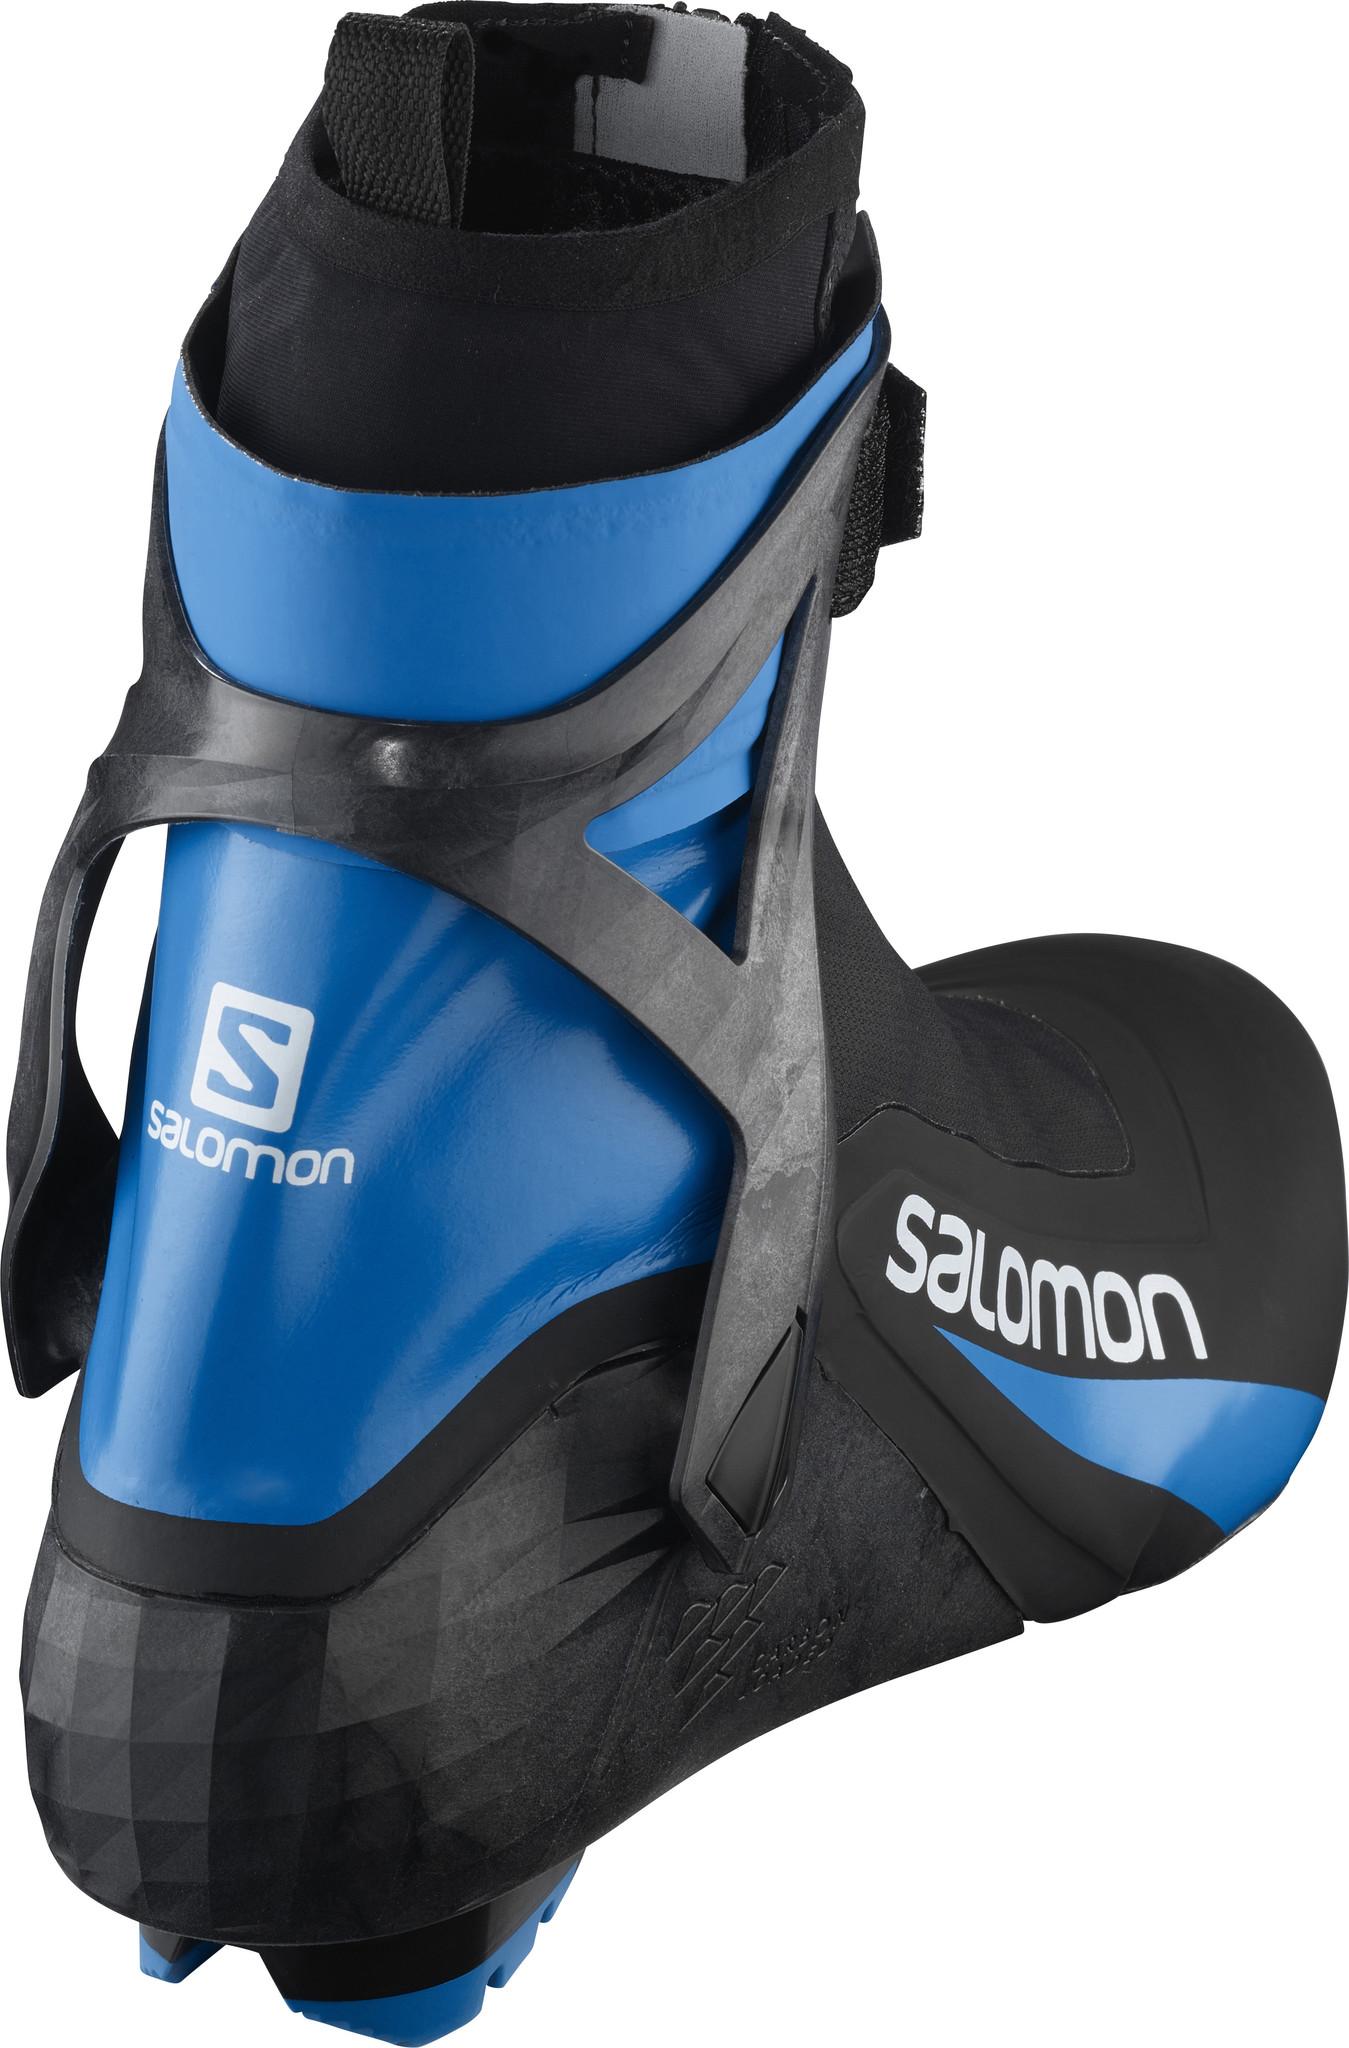 Salomon S/Race Carbon Skate Prolink